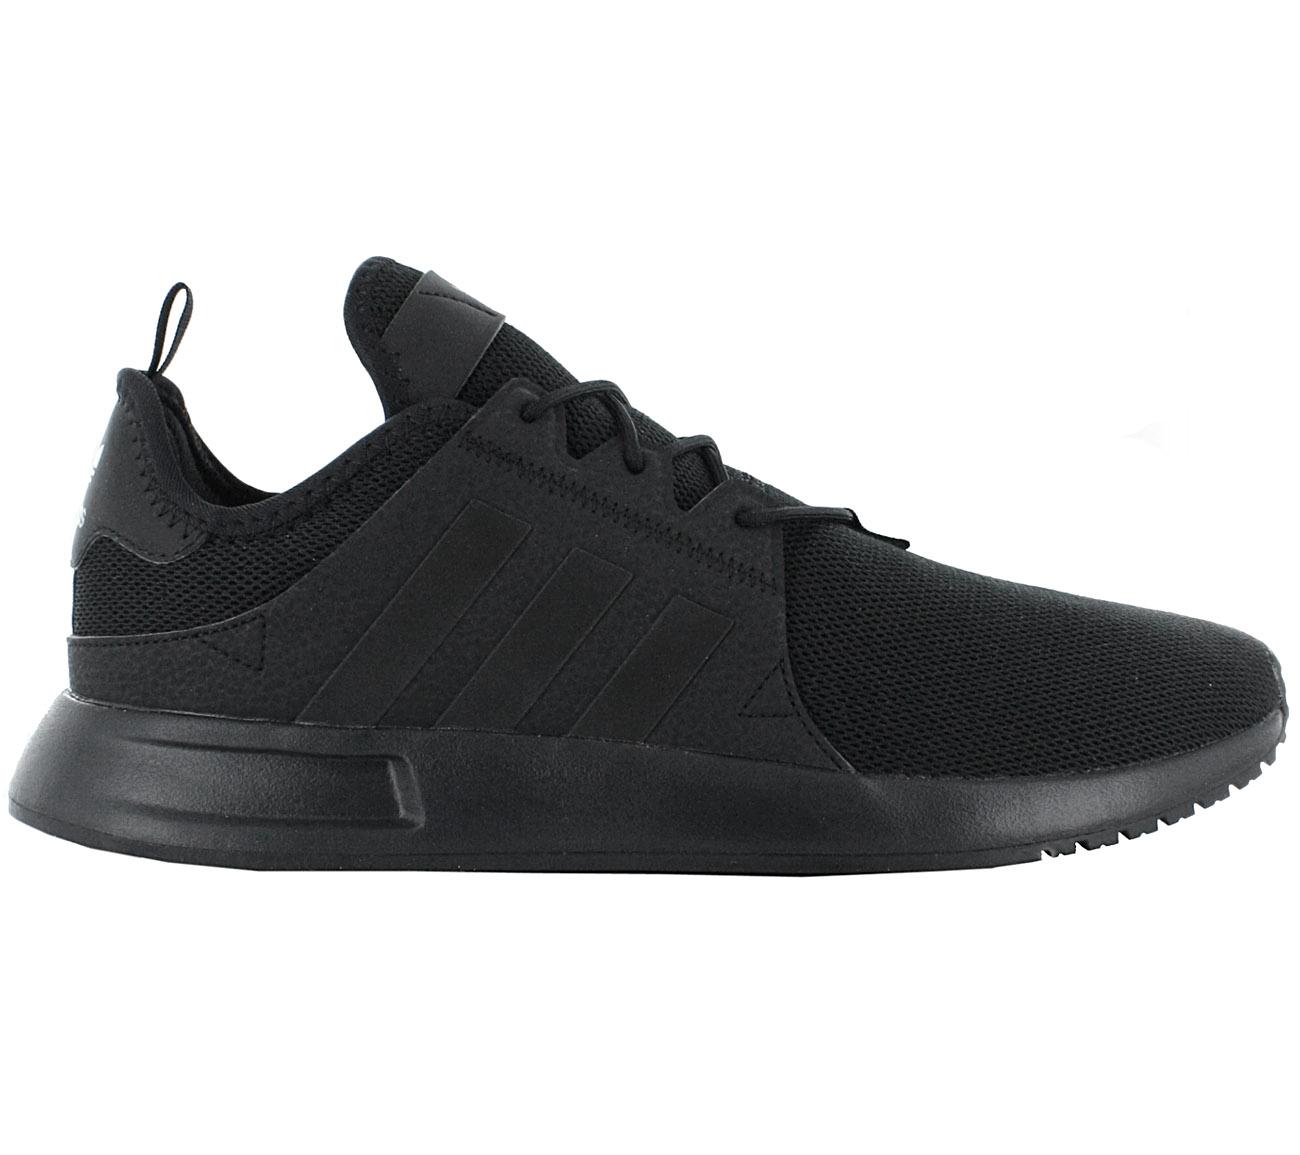 Adidas Men s Sneakers x Plr Shoes Black Sneakers Leisure Fitness ... 786b15b06